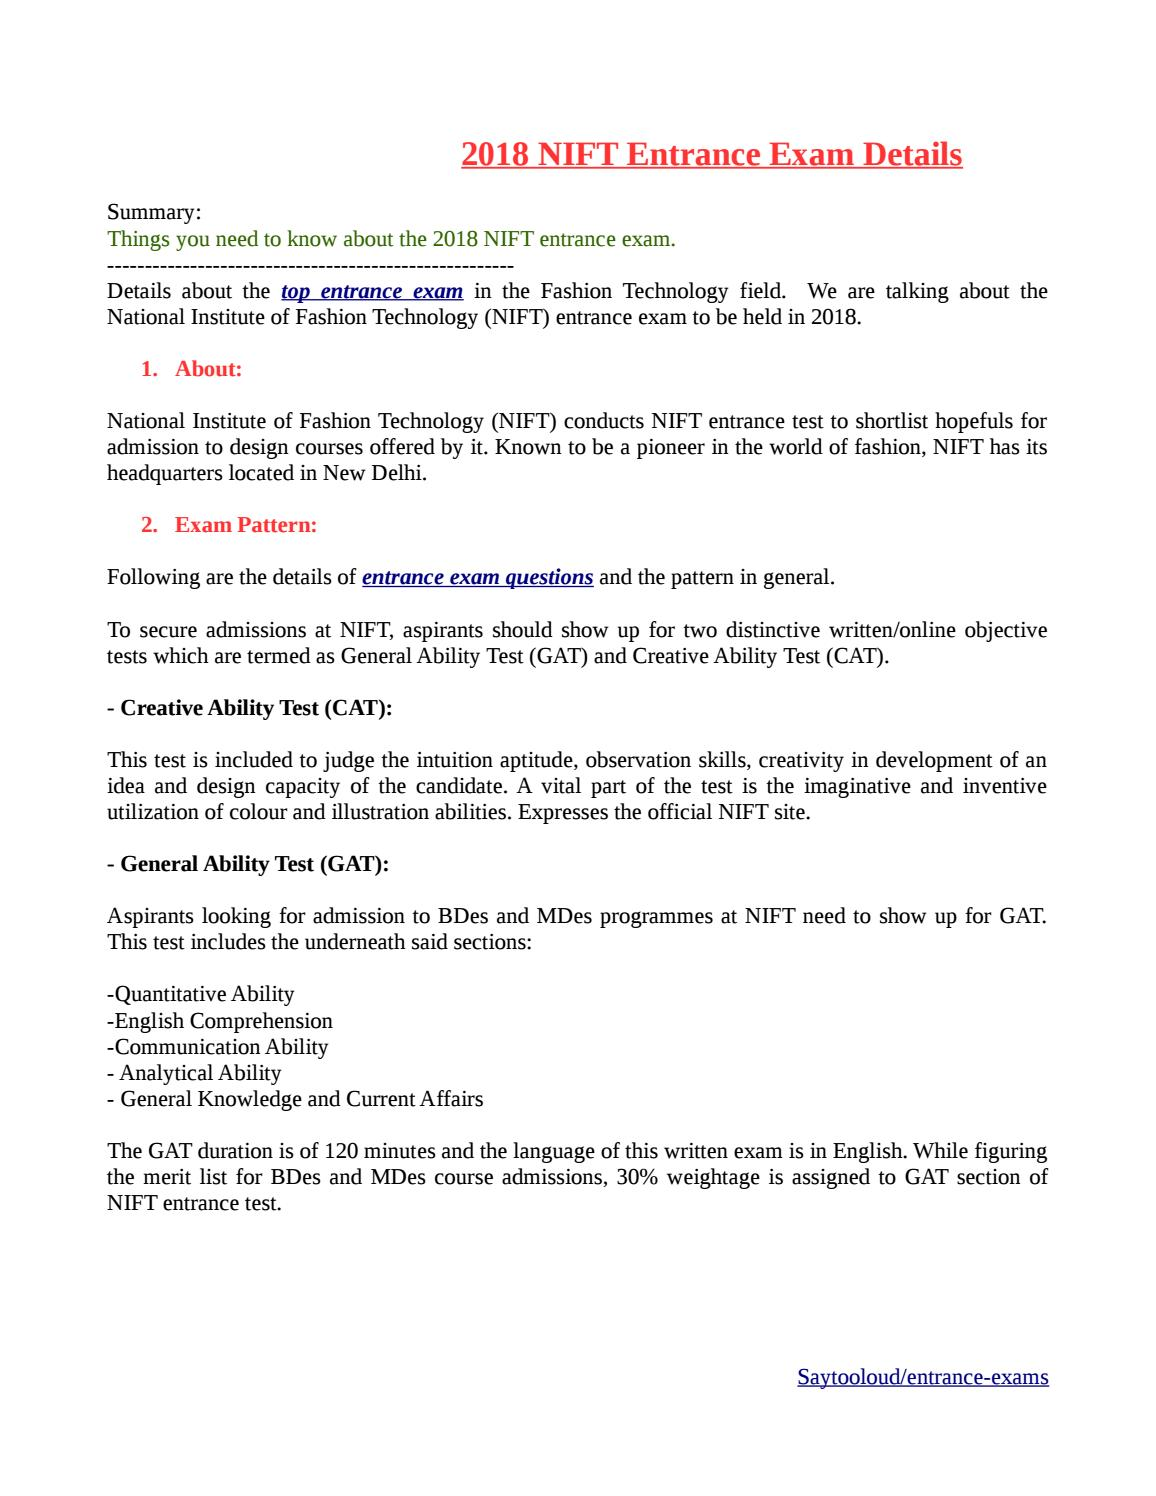 Nift Entrance Exam Details 2018 By Ashwini Sharma Issuu